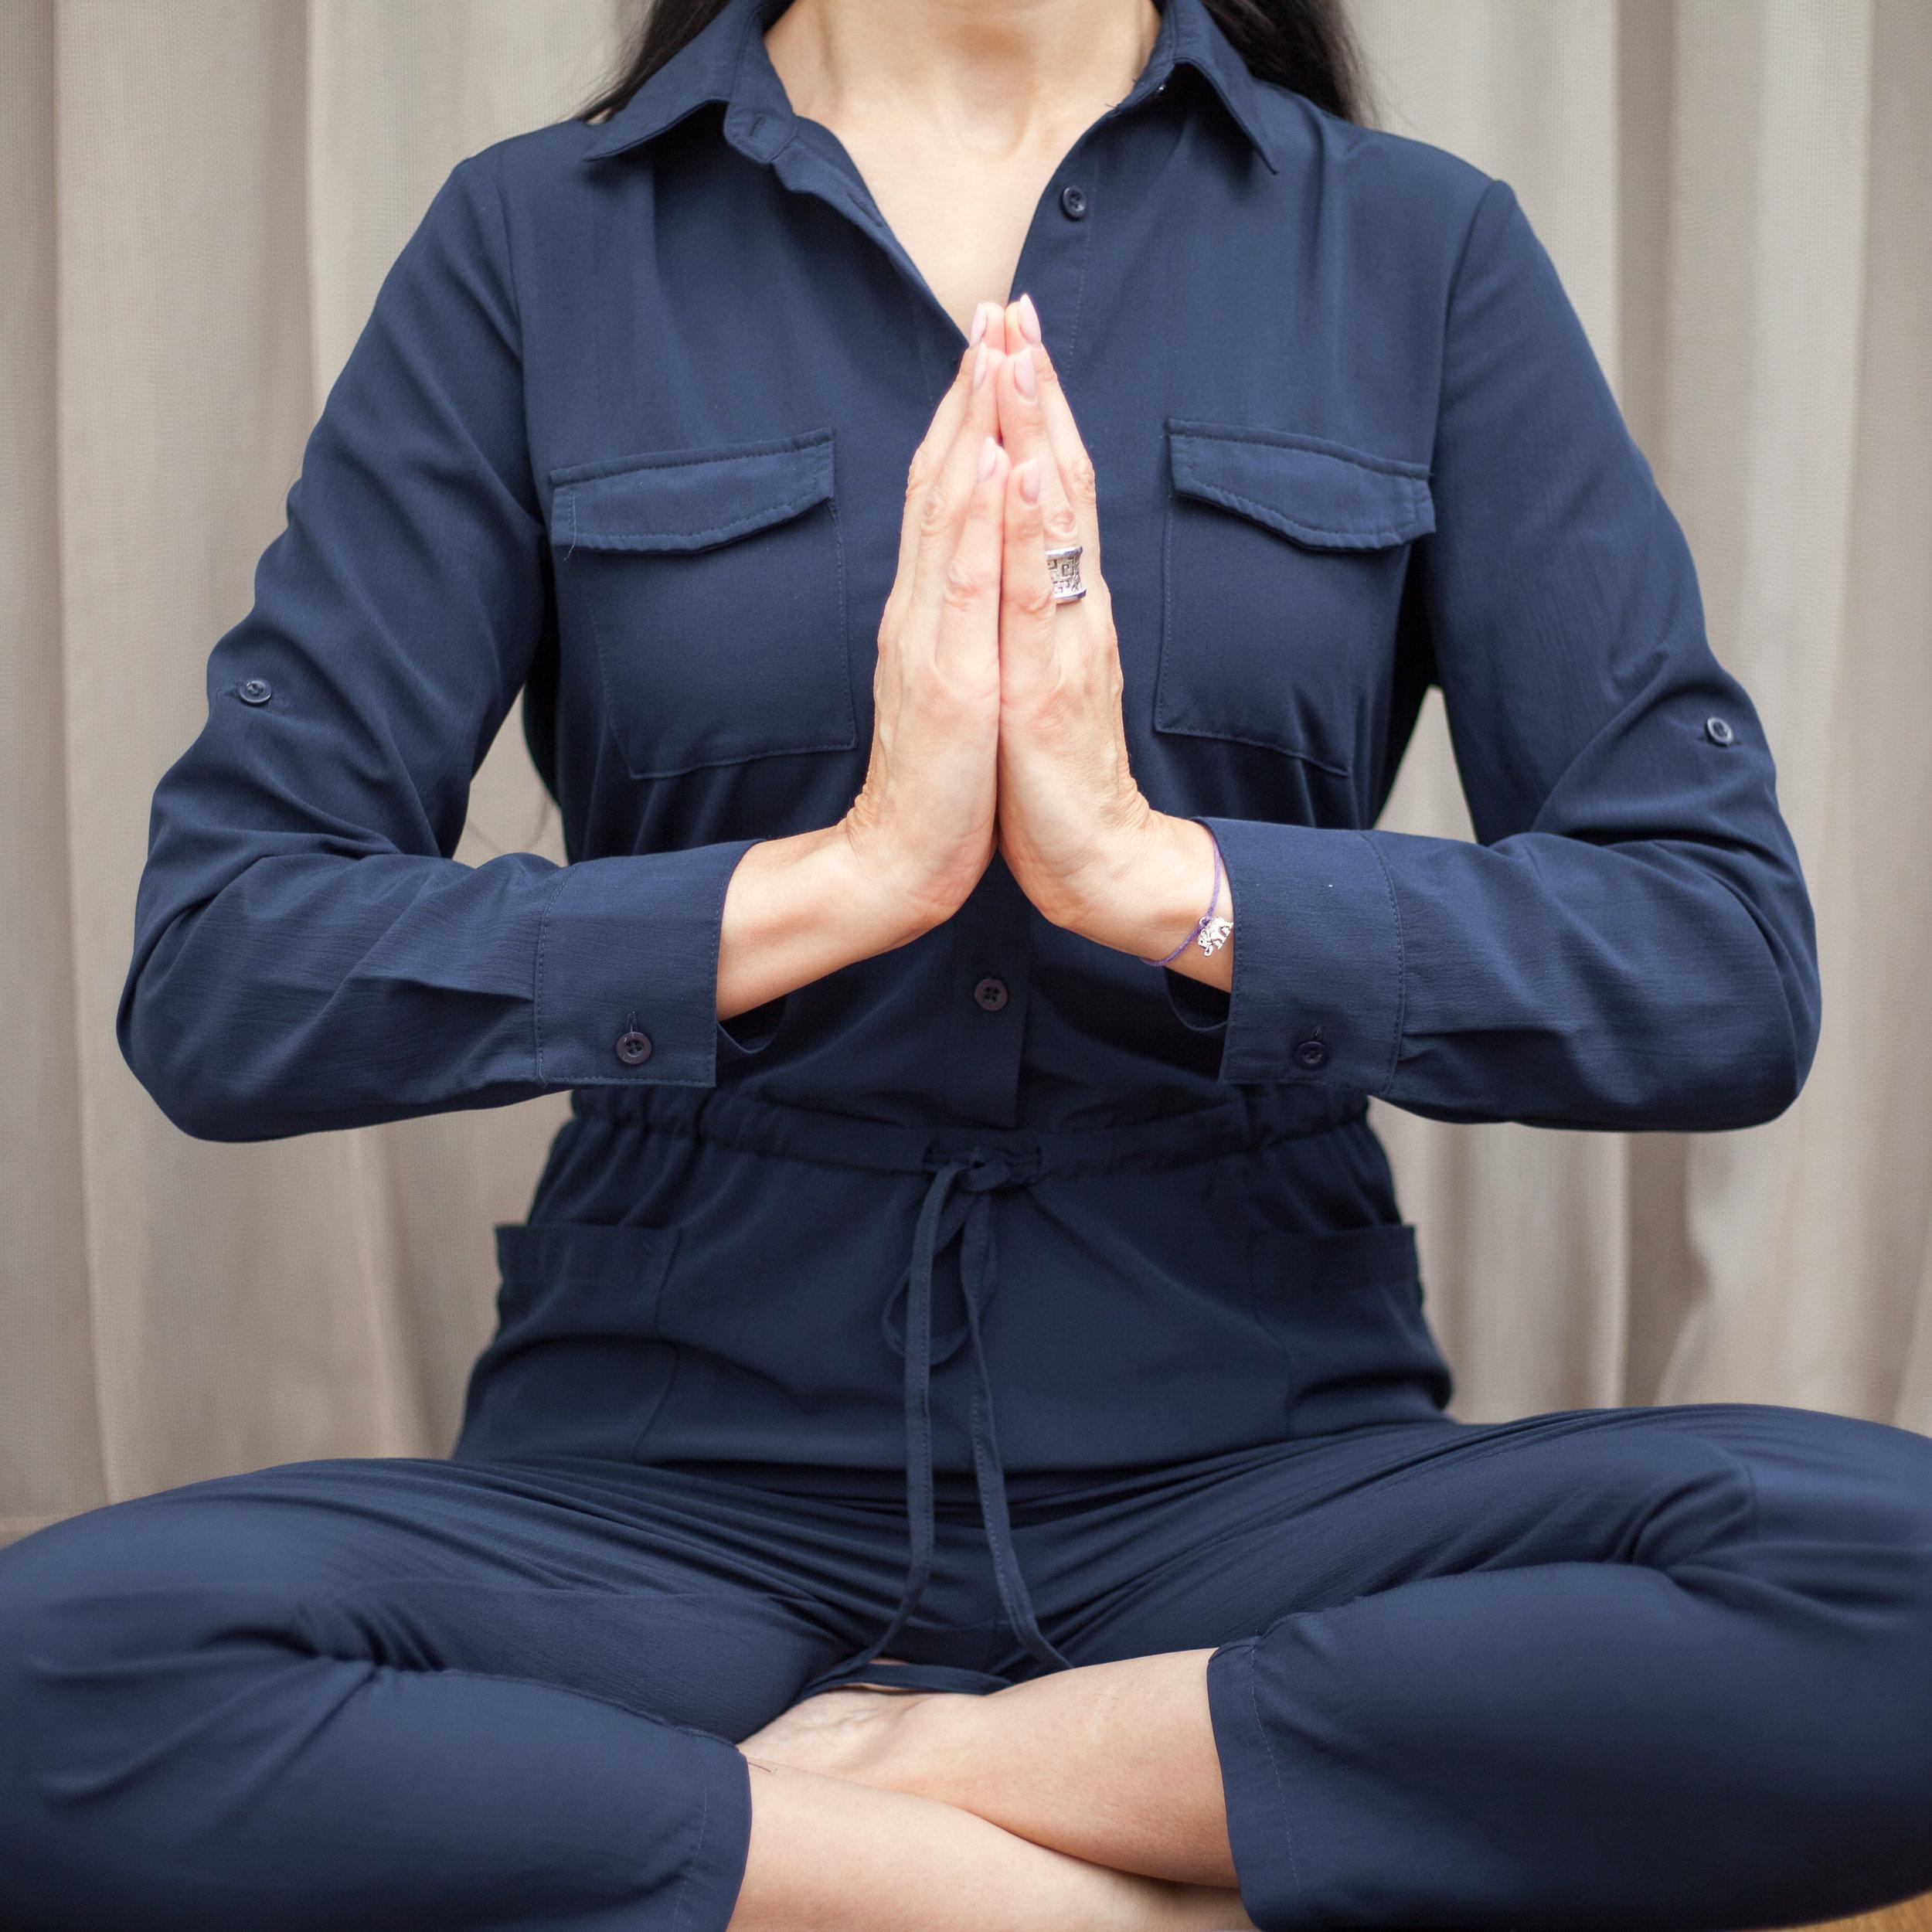 Daily Reiki meditation from Gazelli House South Kensington's reiki master Jasmin Harsono